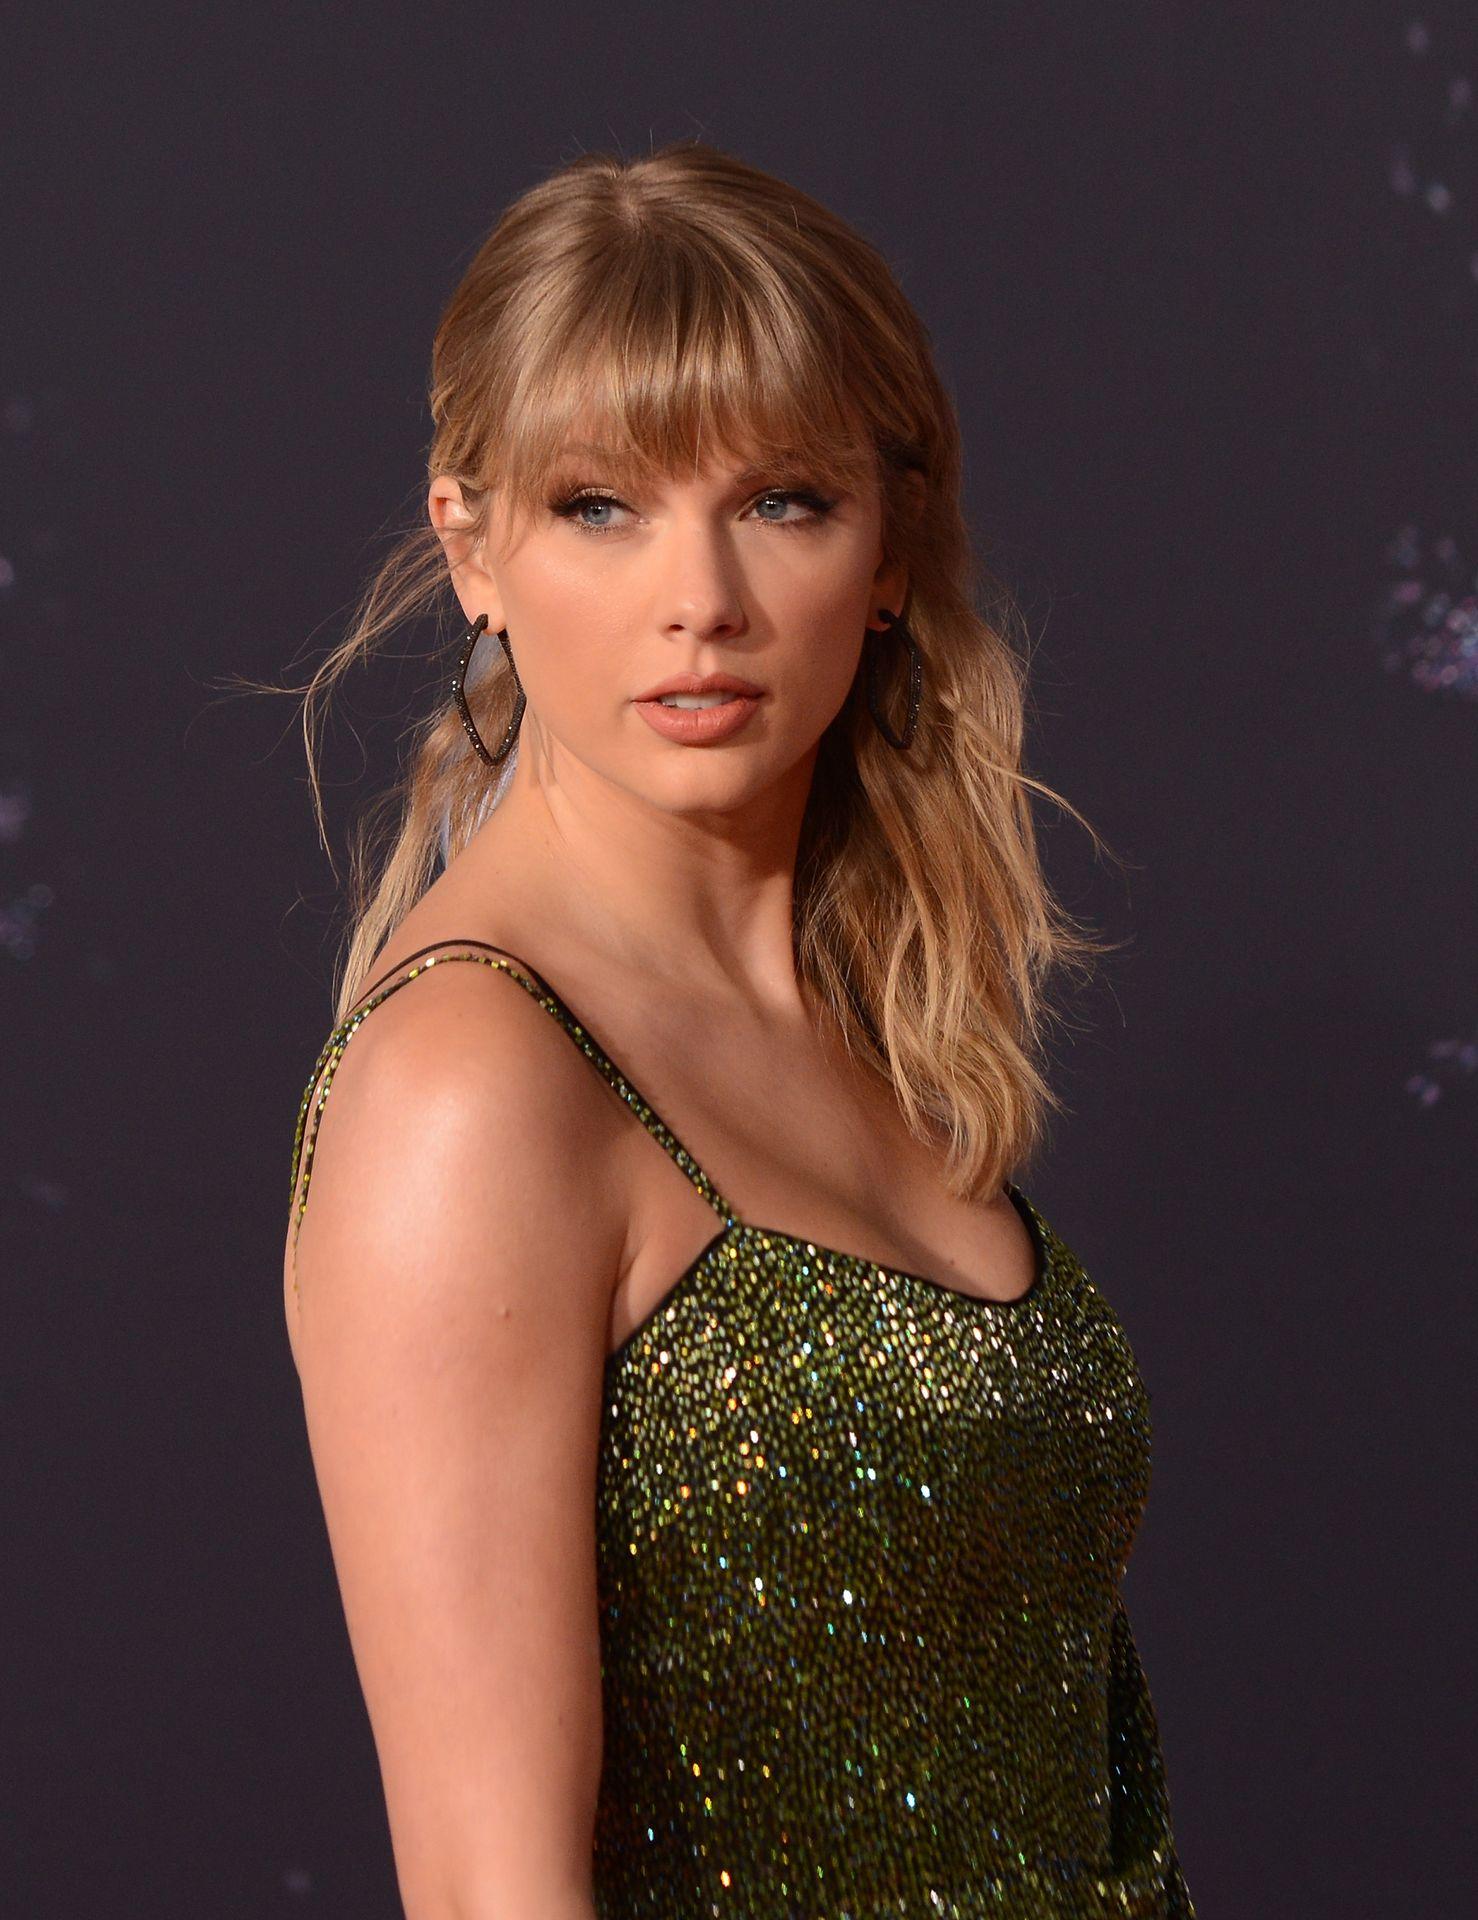 Taylor Swift Sexy 0109